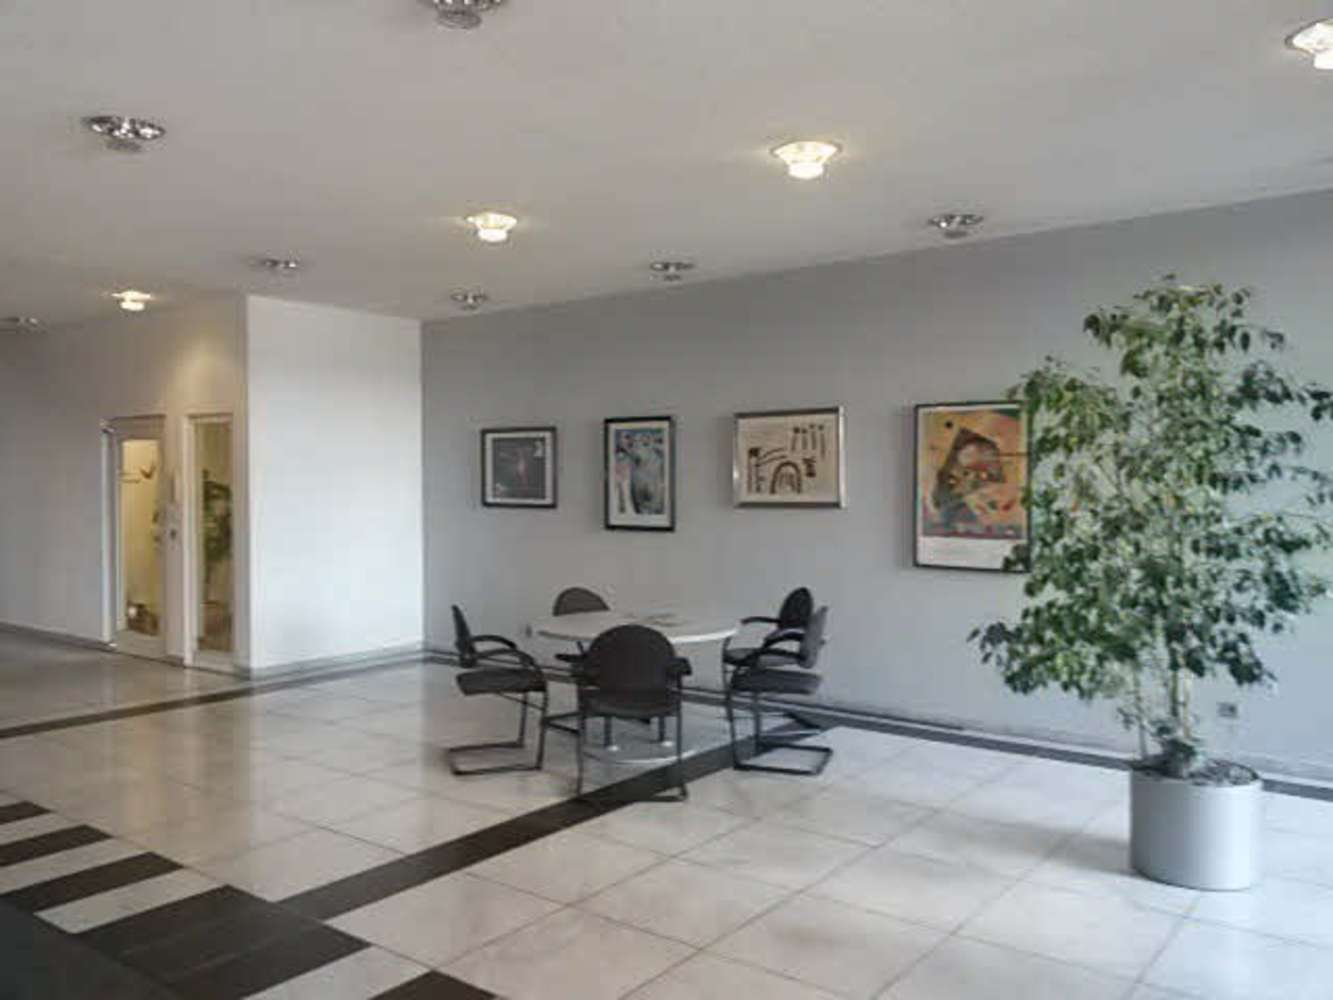 Büros Frankfurt am main, 60437 - Büro - Frankfurt am Main, Nieder-Eschbach - F1908 - 10645647